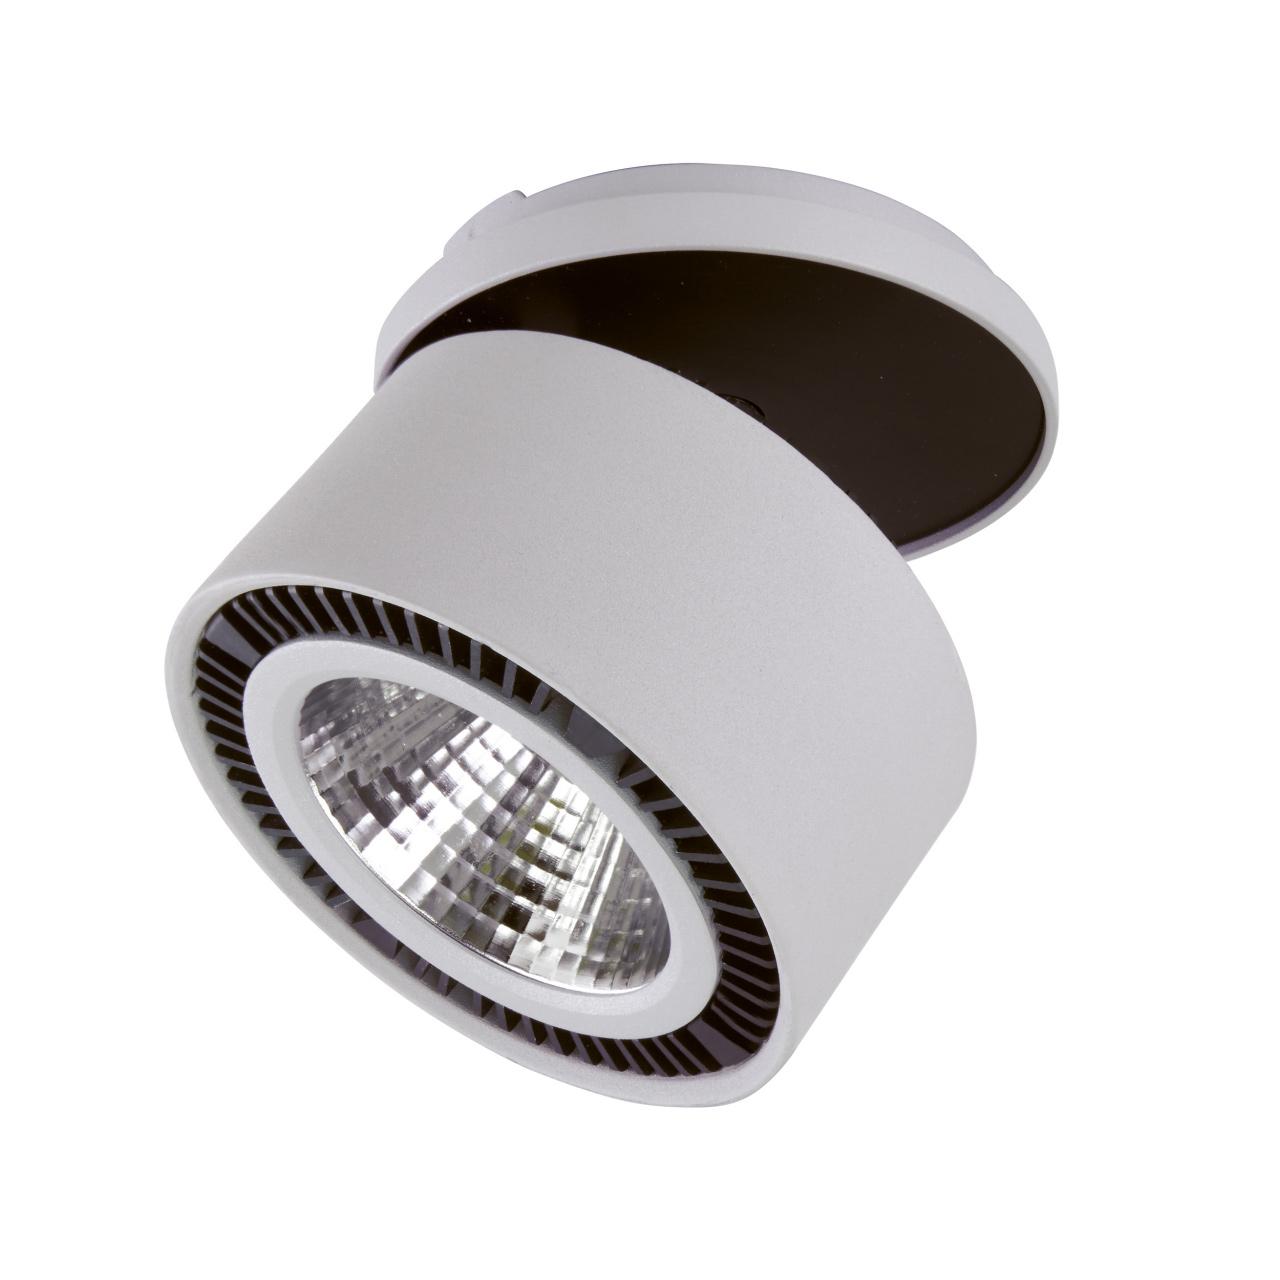 Светильник Forte inca LED 26W 1950LM 30G серый 4000K Lightstar 214829